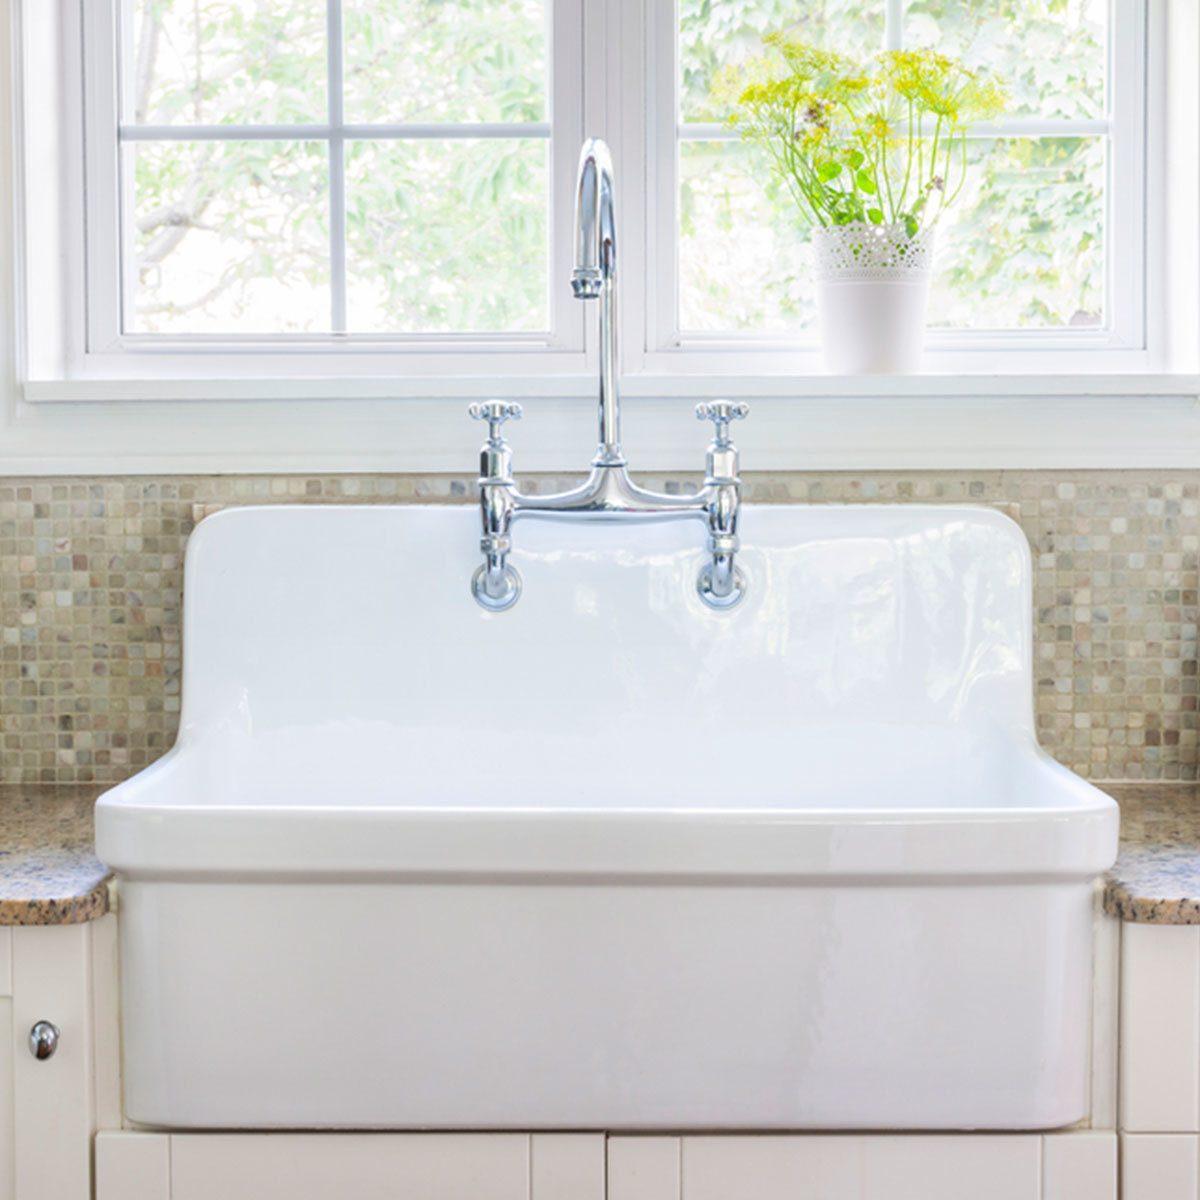 Farmhouse Look: Apron Sink